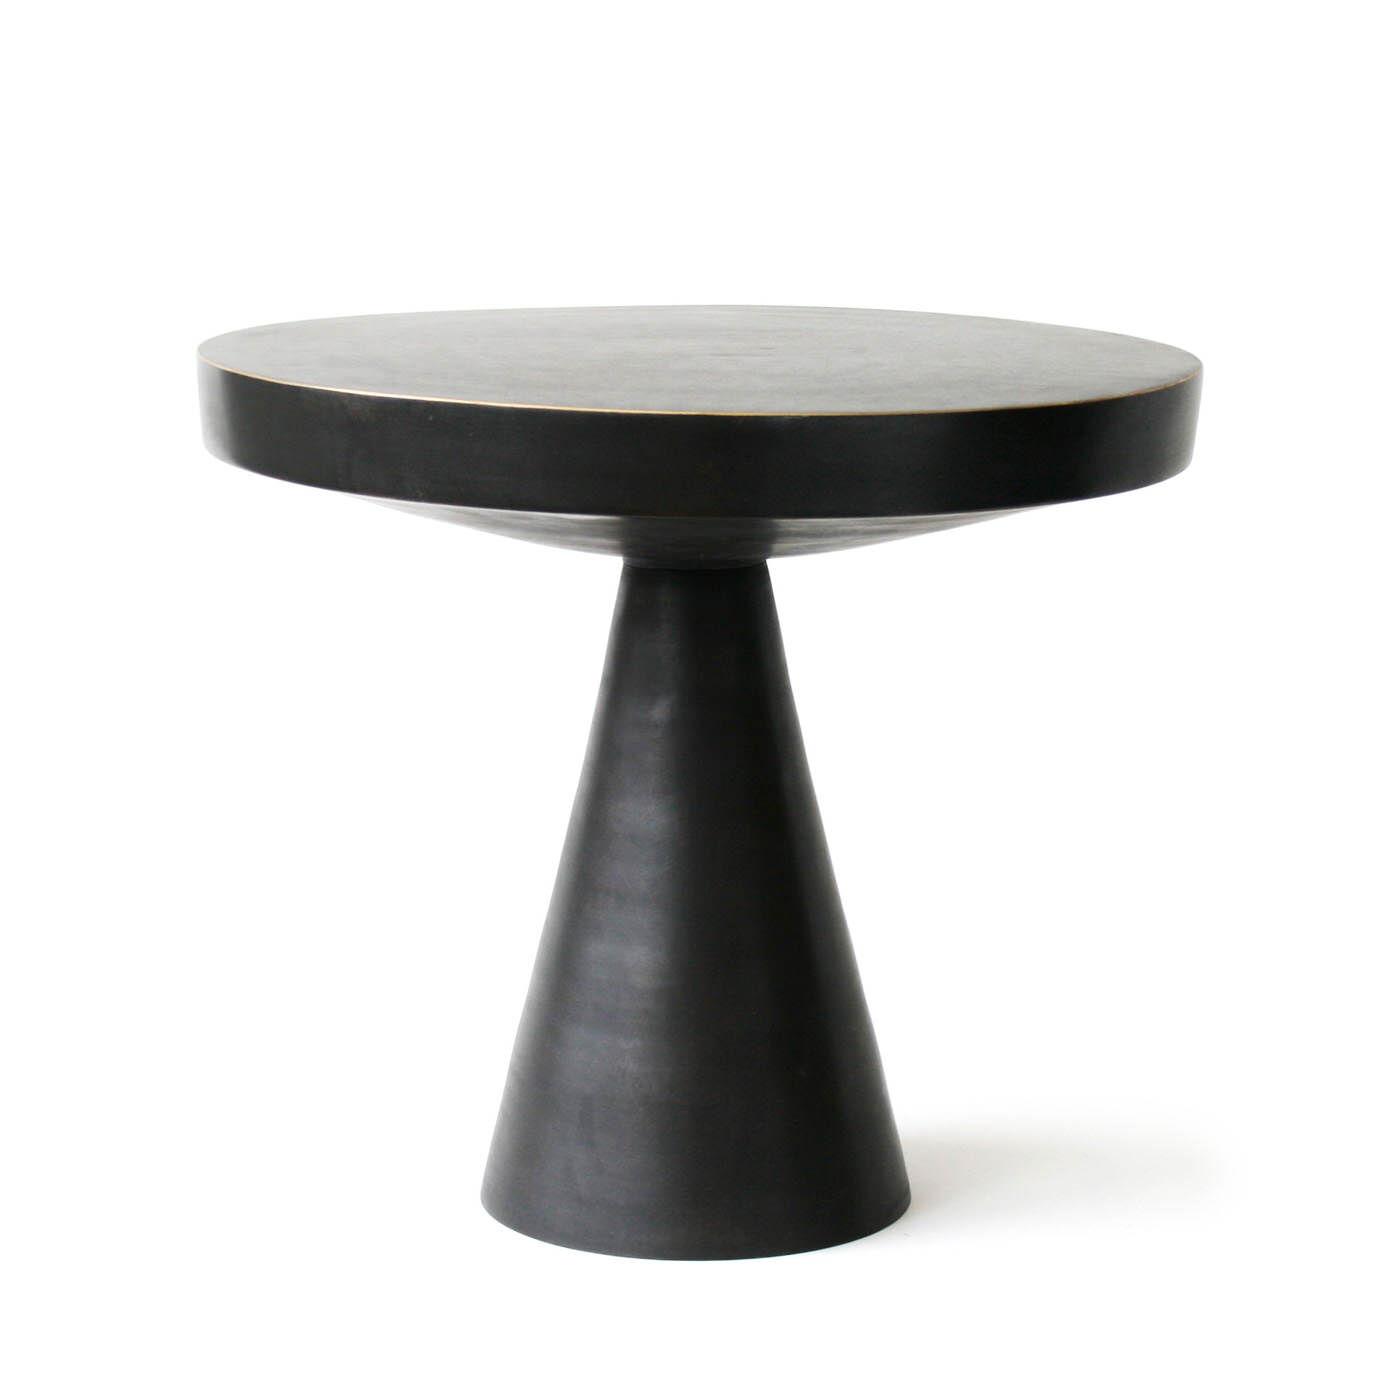 Hans Pedestal Side Table Modern Furniture Jonathan Adler